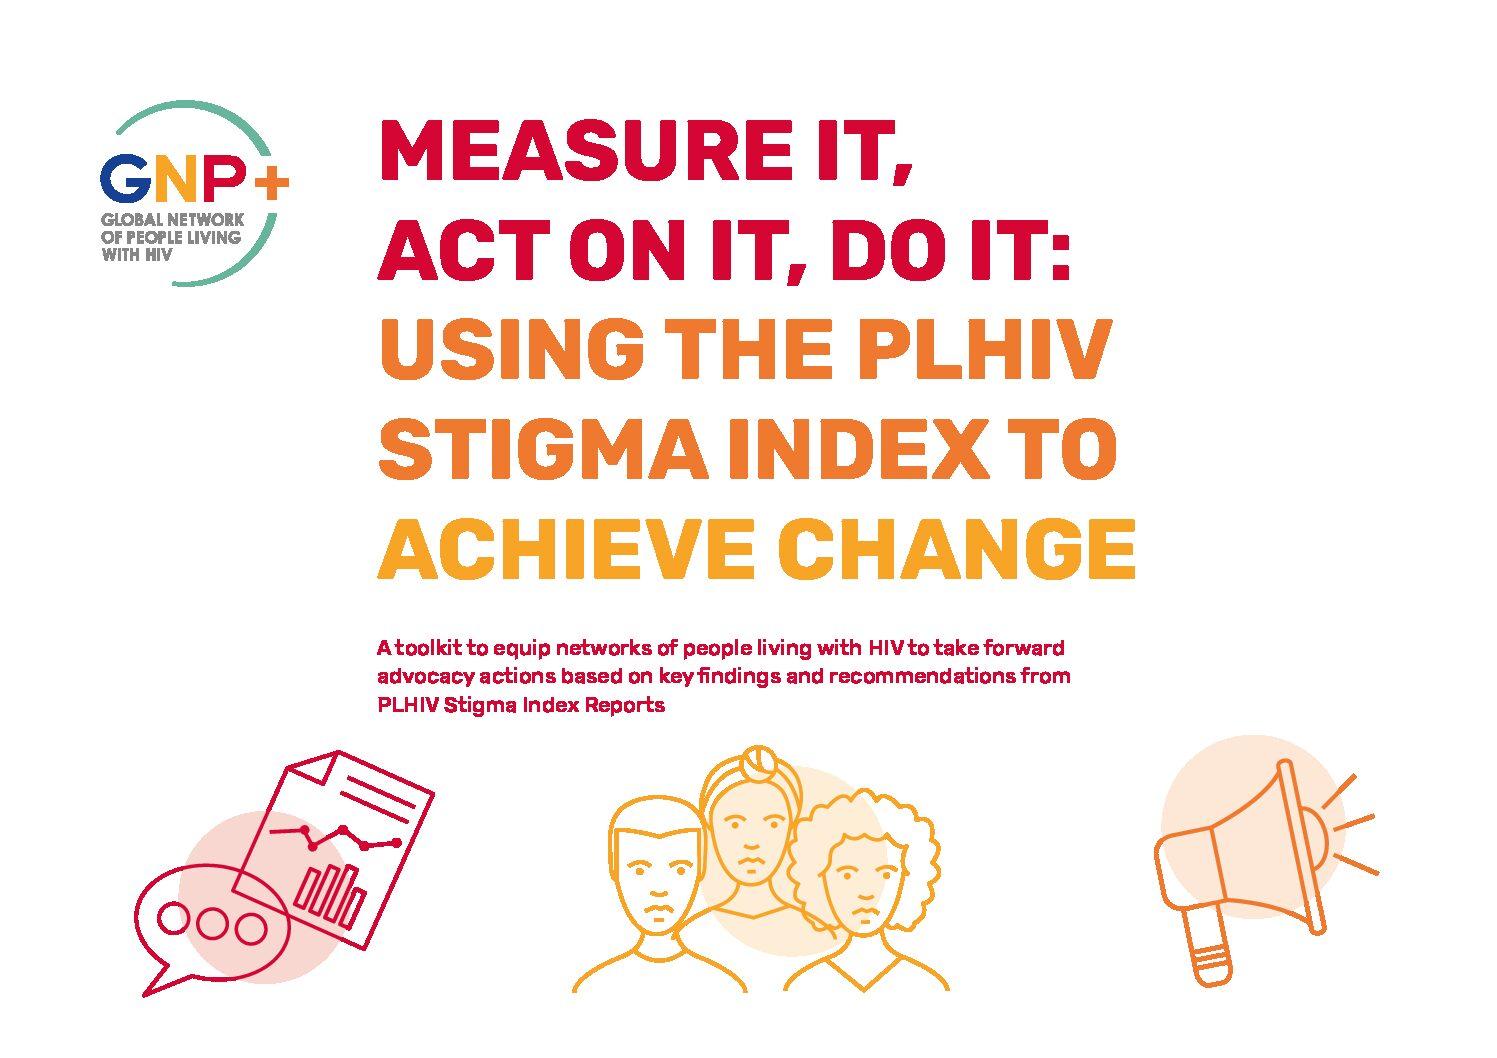 PLHIV Stigma Index Advocacy Toolkit